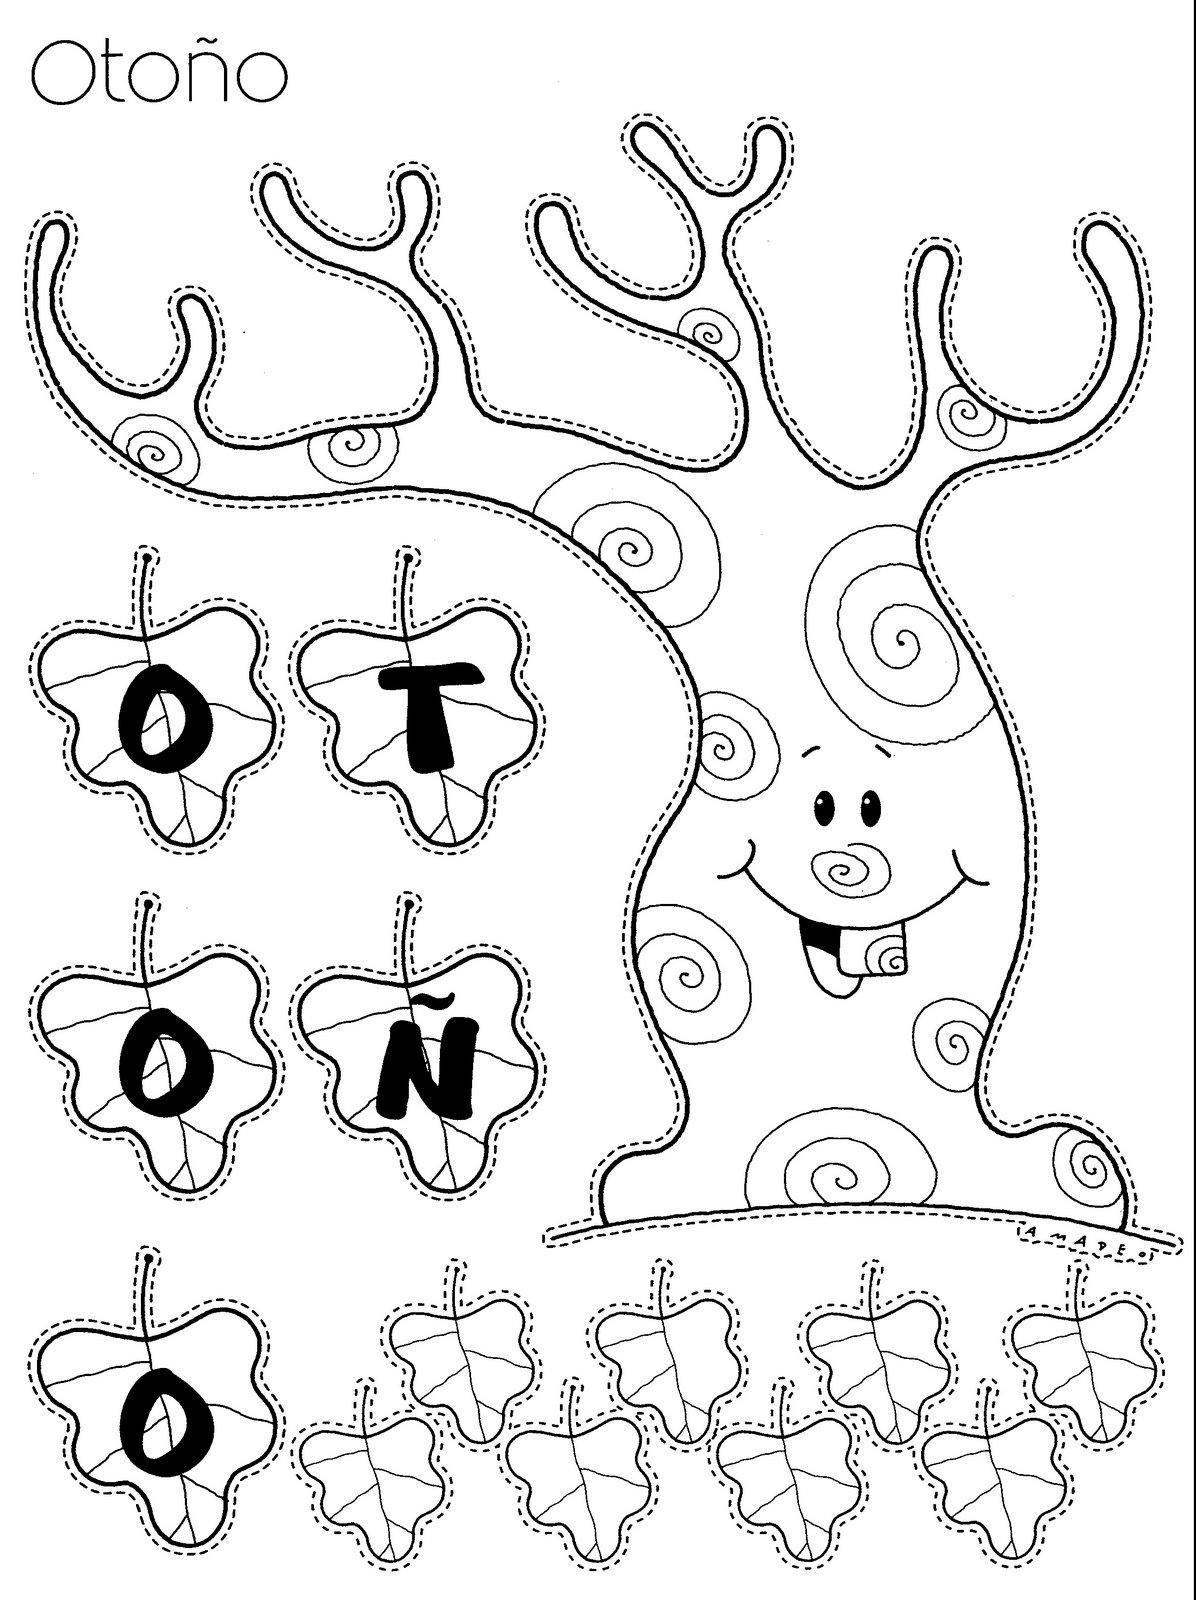 Dibujos Para Imprimir Del Otoño Aqua Natura Benidorm Tarifas